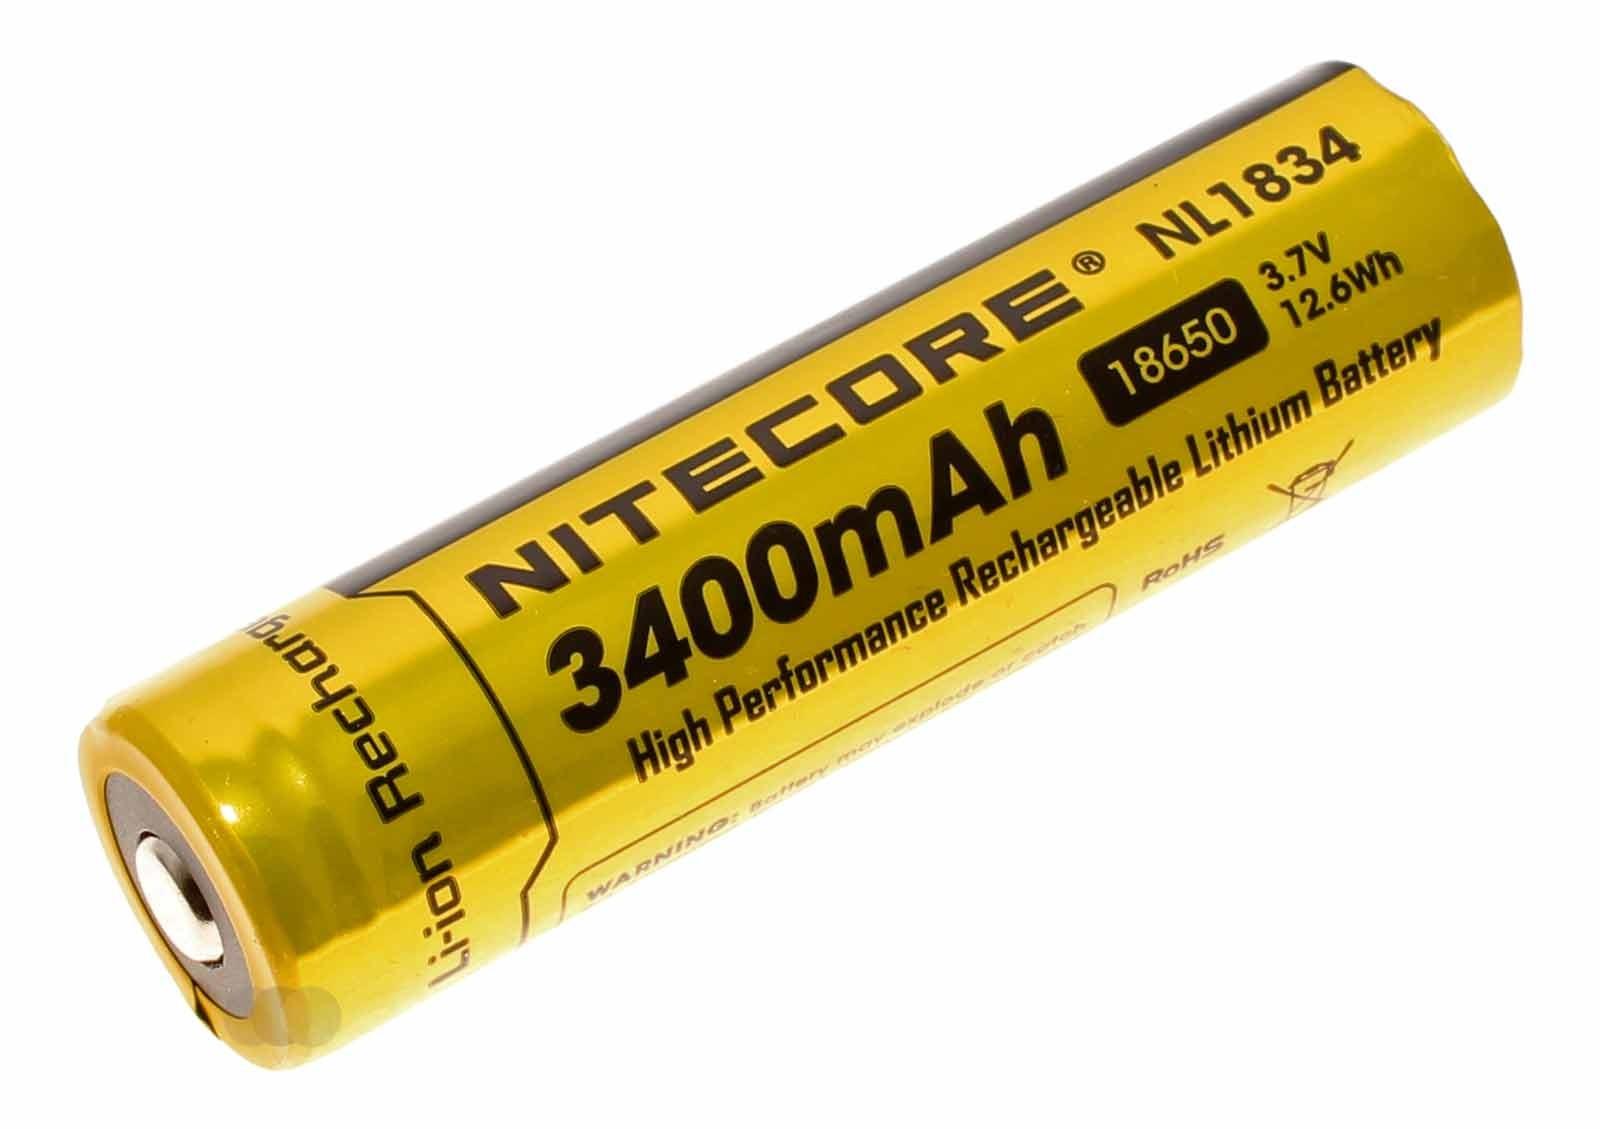 NiteCore NL1834 18650 Li-Ion spezial Akku 3,7 Volt und 3400mAh Kapazität, B-Ware ohne Blisterverpackung